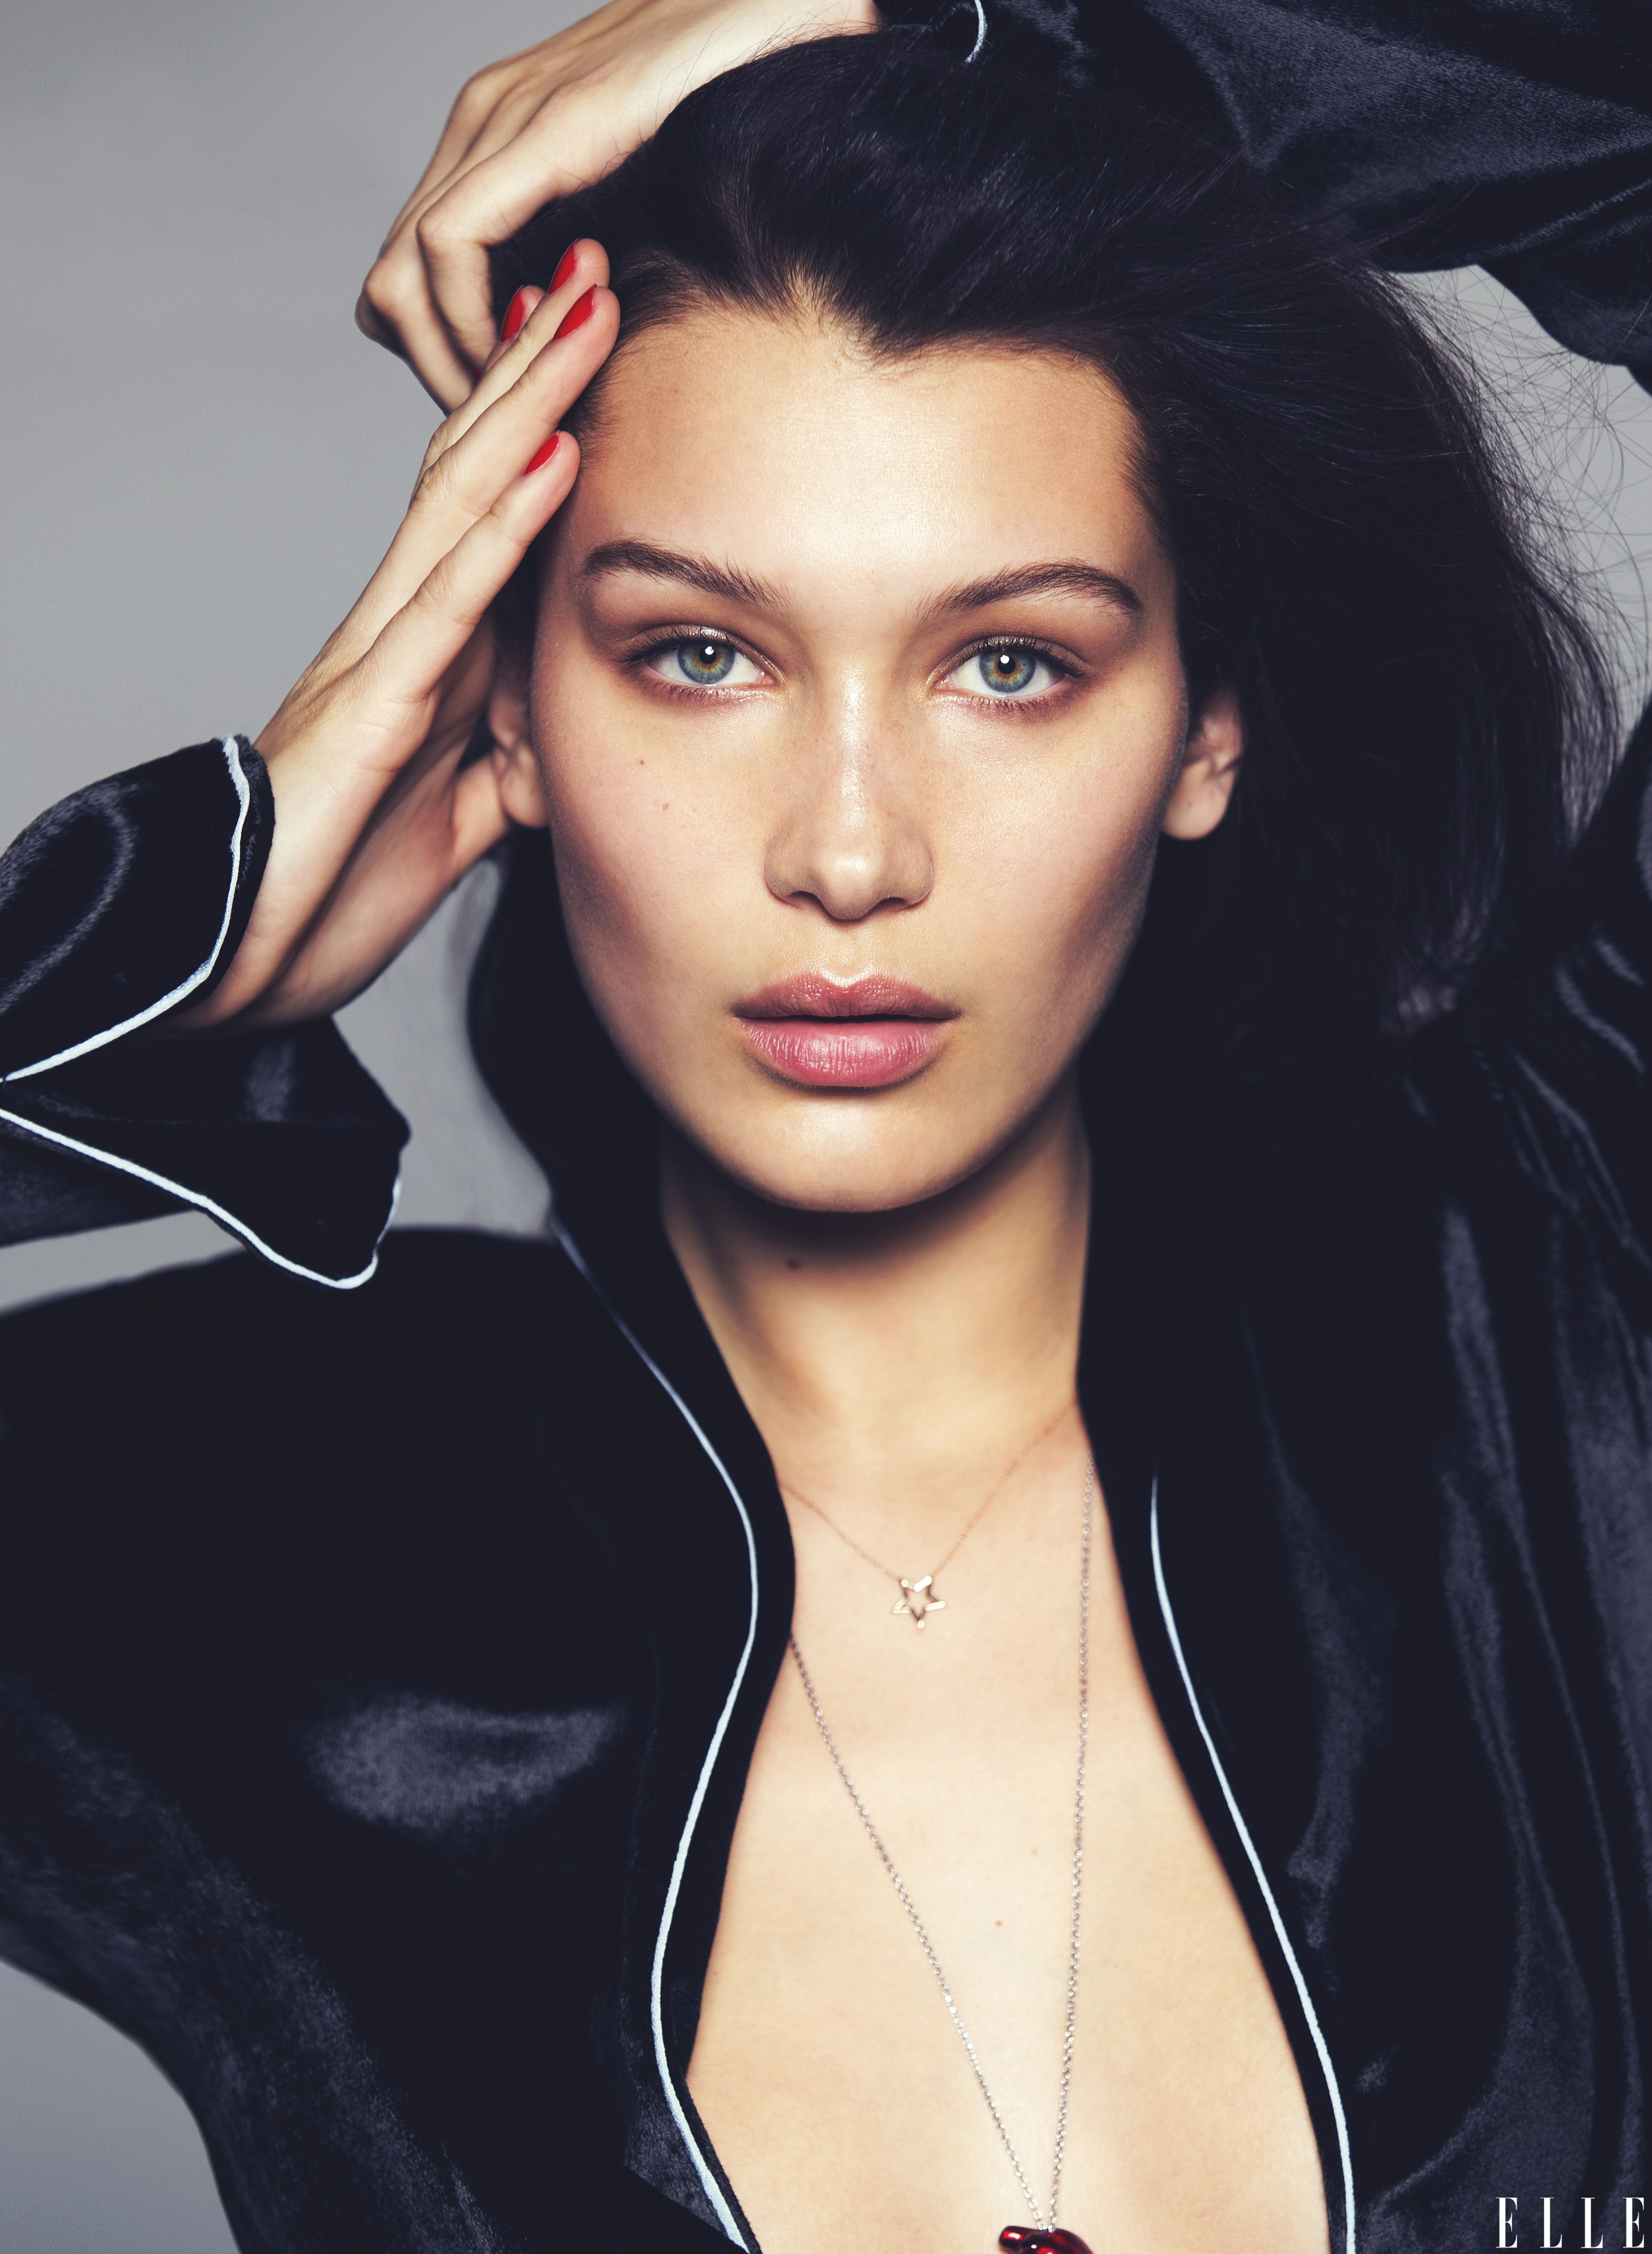 The 20-years-old American fashion model Bella Hadid